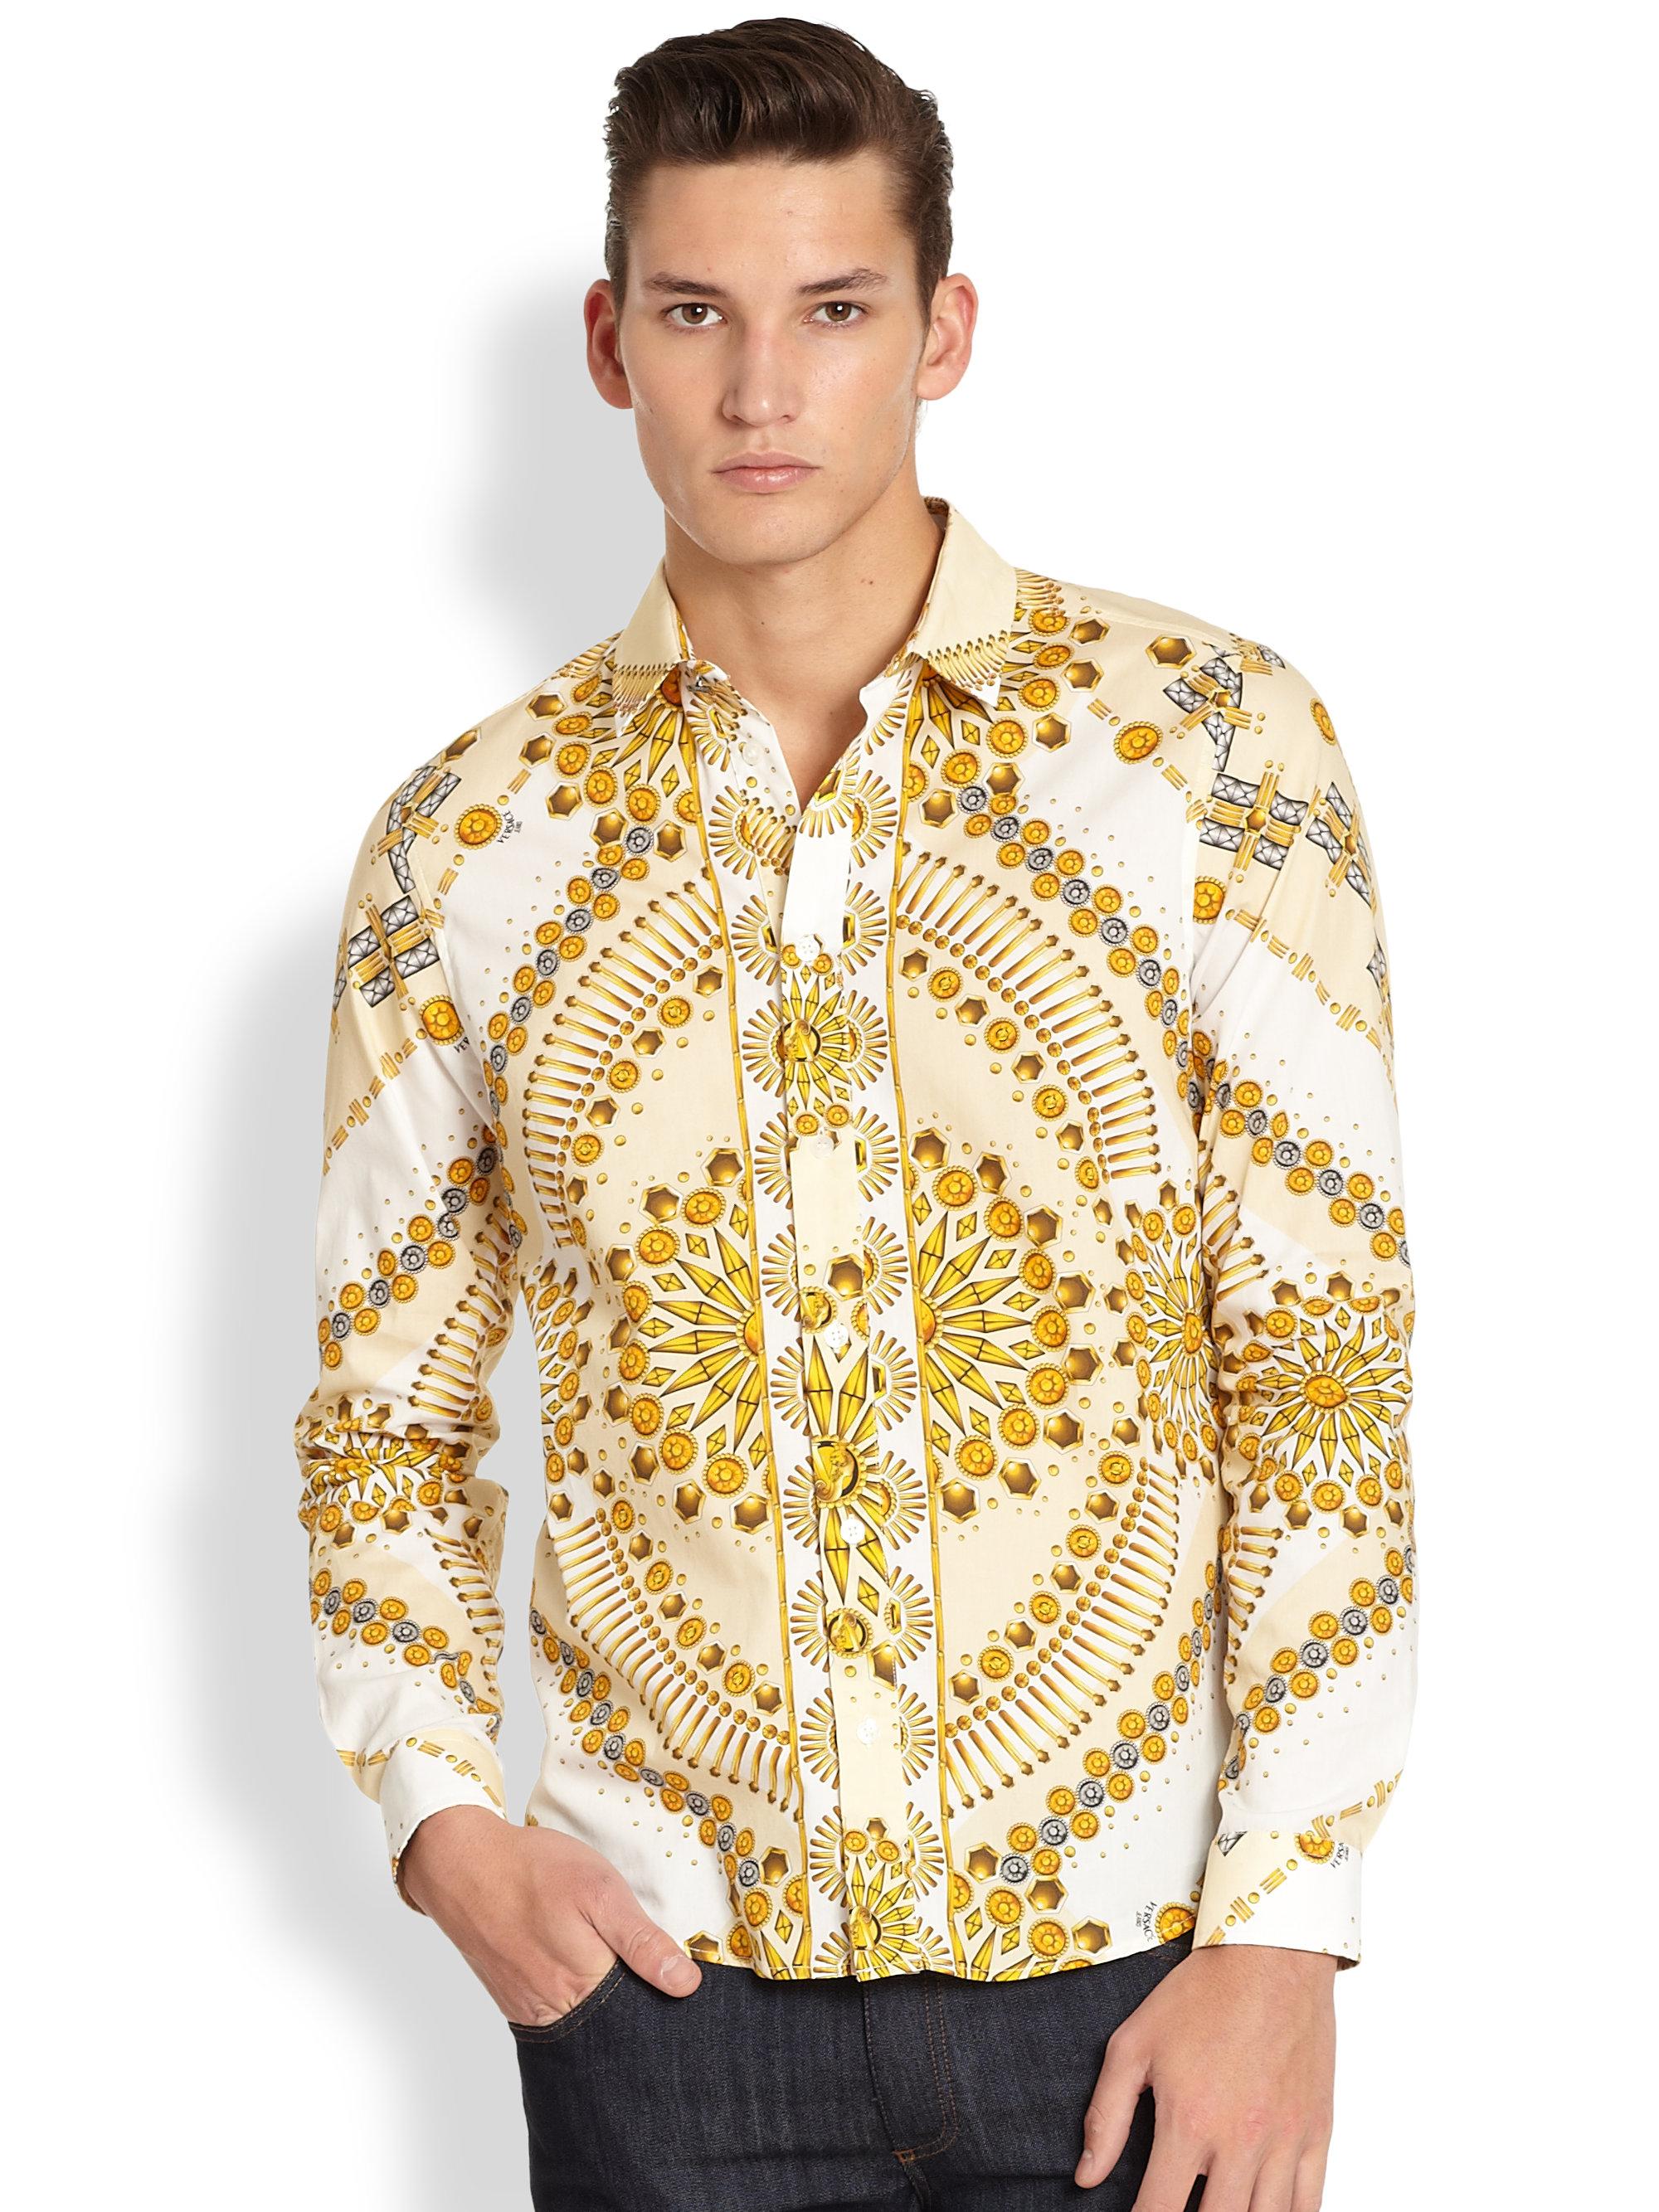 71b53d8f138 Lyst - Versace Jeans Gold Print Sportshirt in Metallic for Men